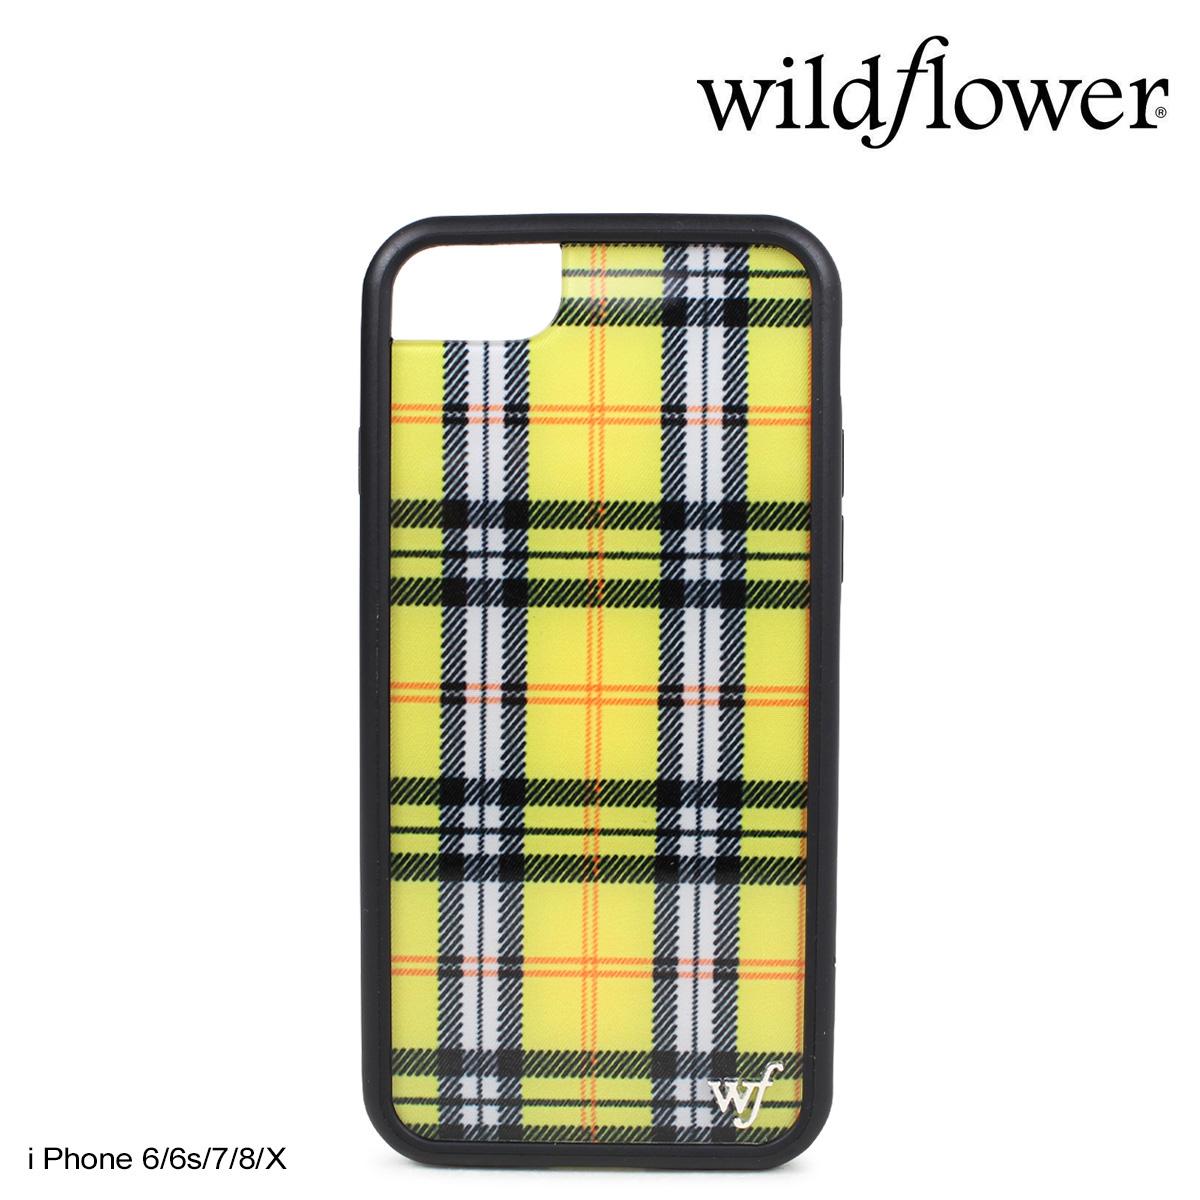 timeless design cf782 7b598 wildflower iPhone8 X 7 iPhone case 6 6s wild flower smartphone eyephone  Lady's check yellow YPLA